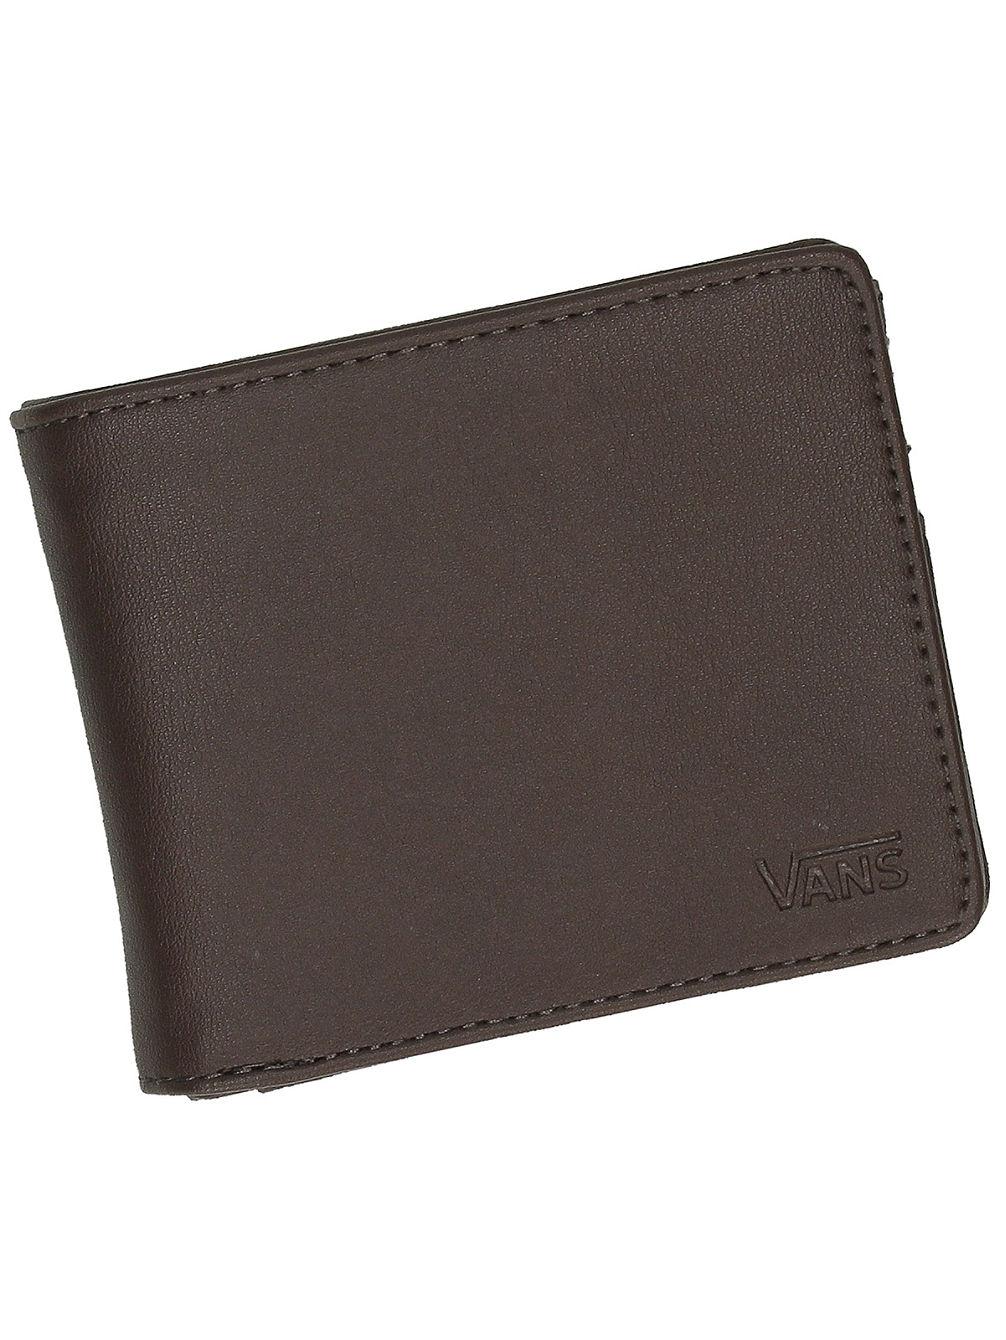 5cbee3a22c9112 Buy Vans Drop V Bifold Wallet online at Blue Tomato